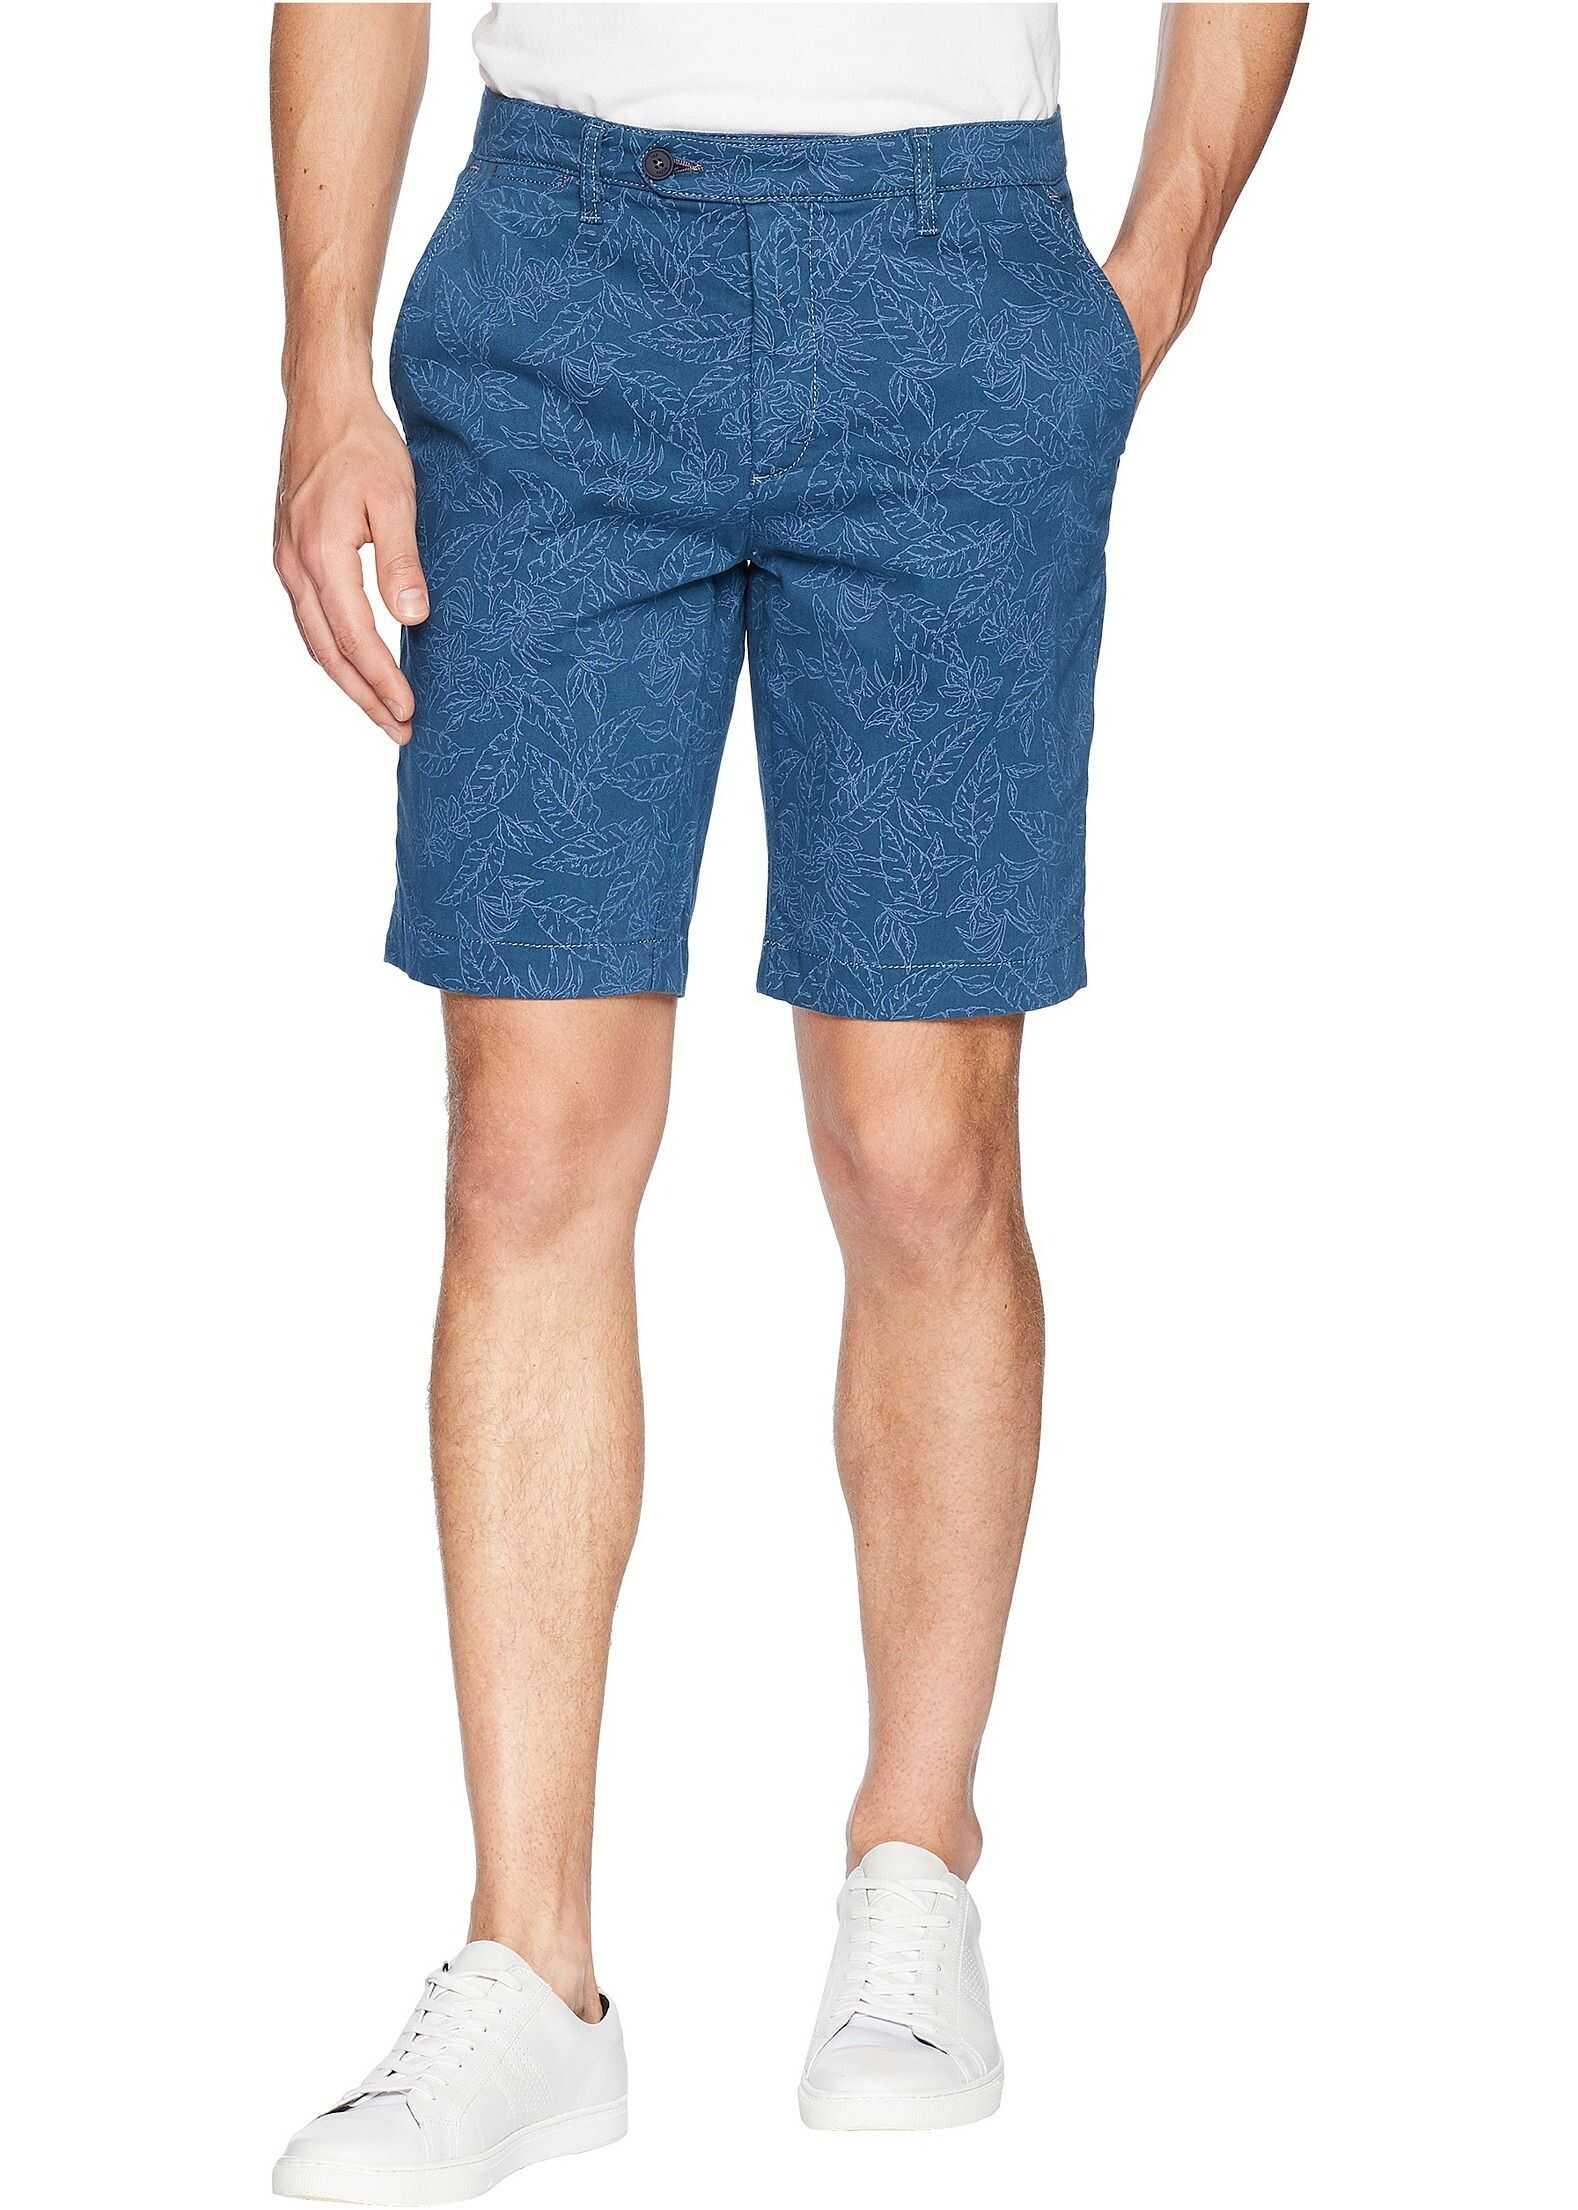 Leafee Leaf Print Shorts